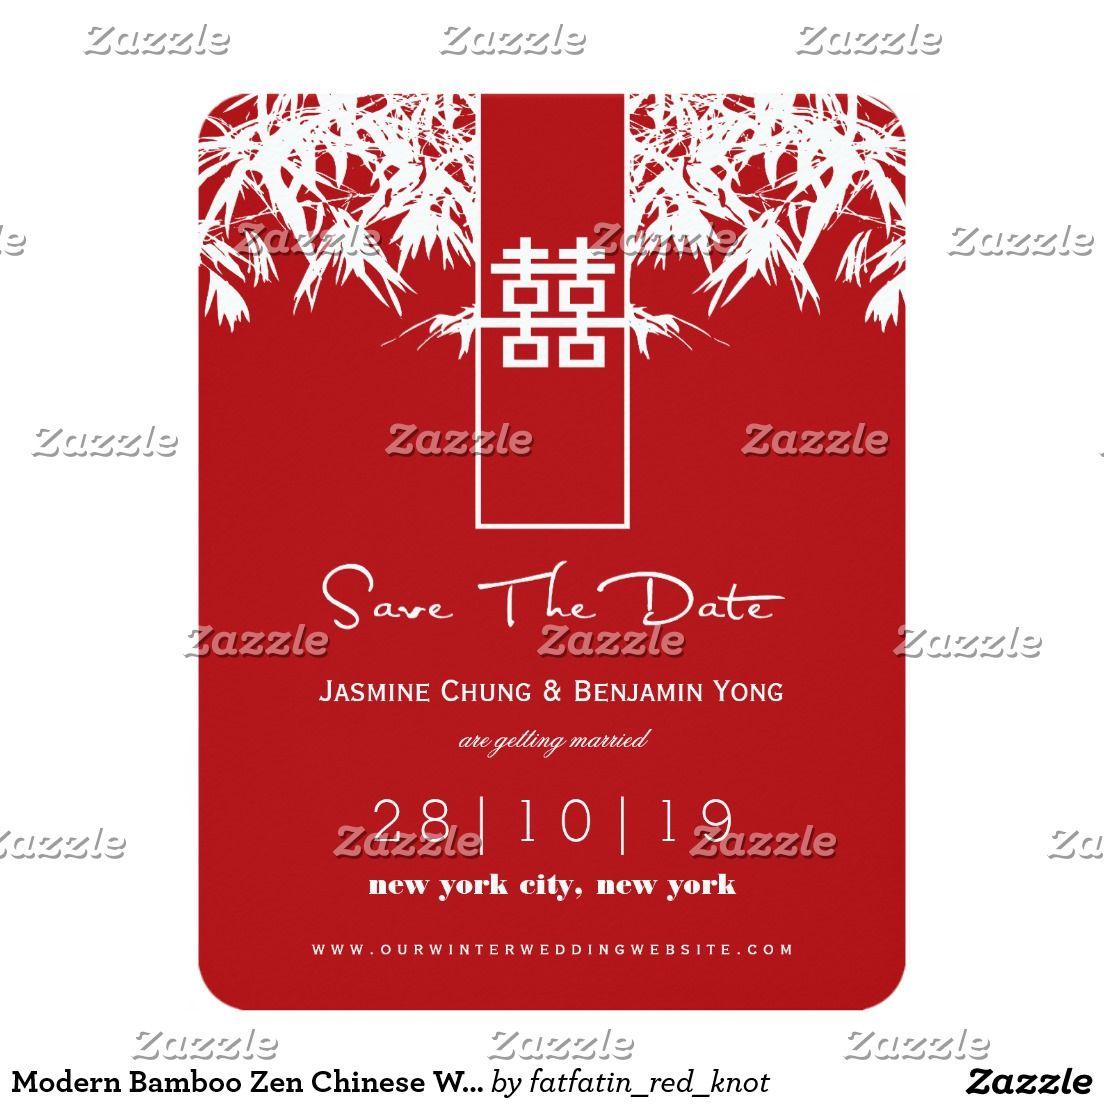 Modern Bamboo Zen Chinese Wedding Save The Date Invitation ...